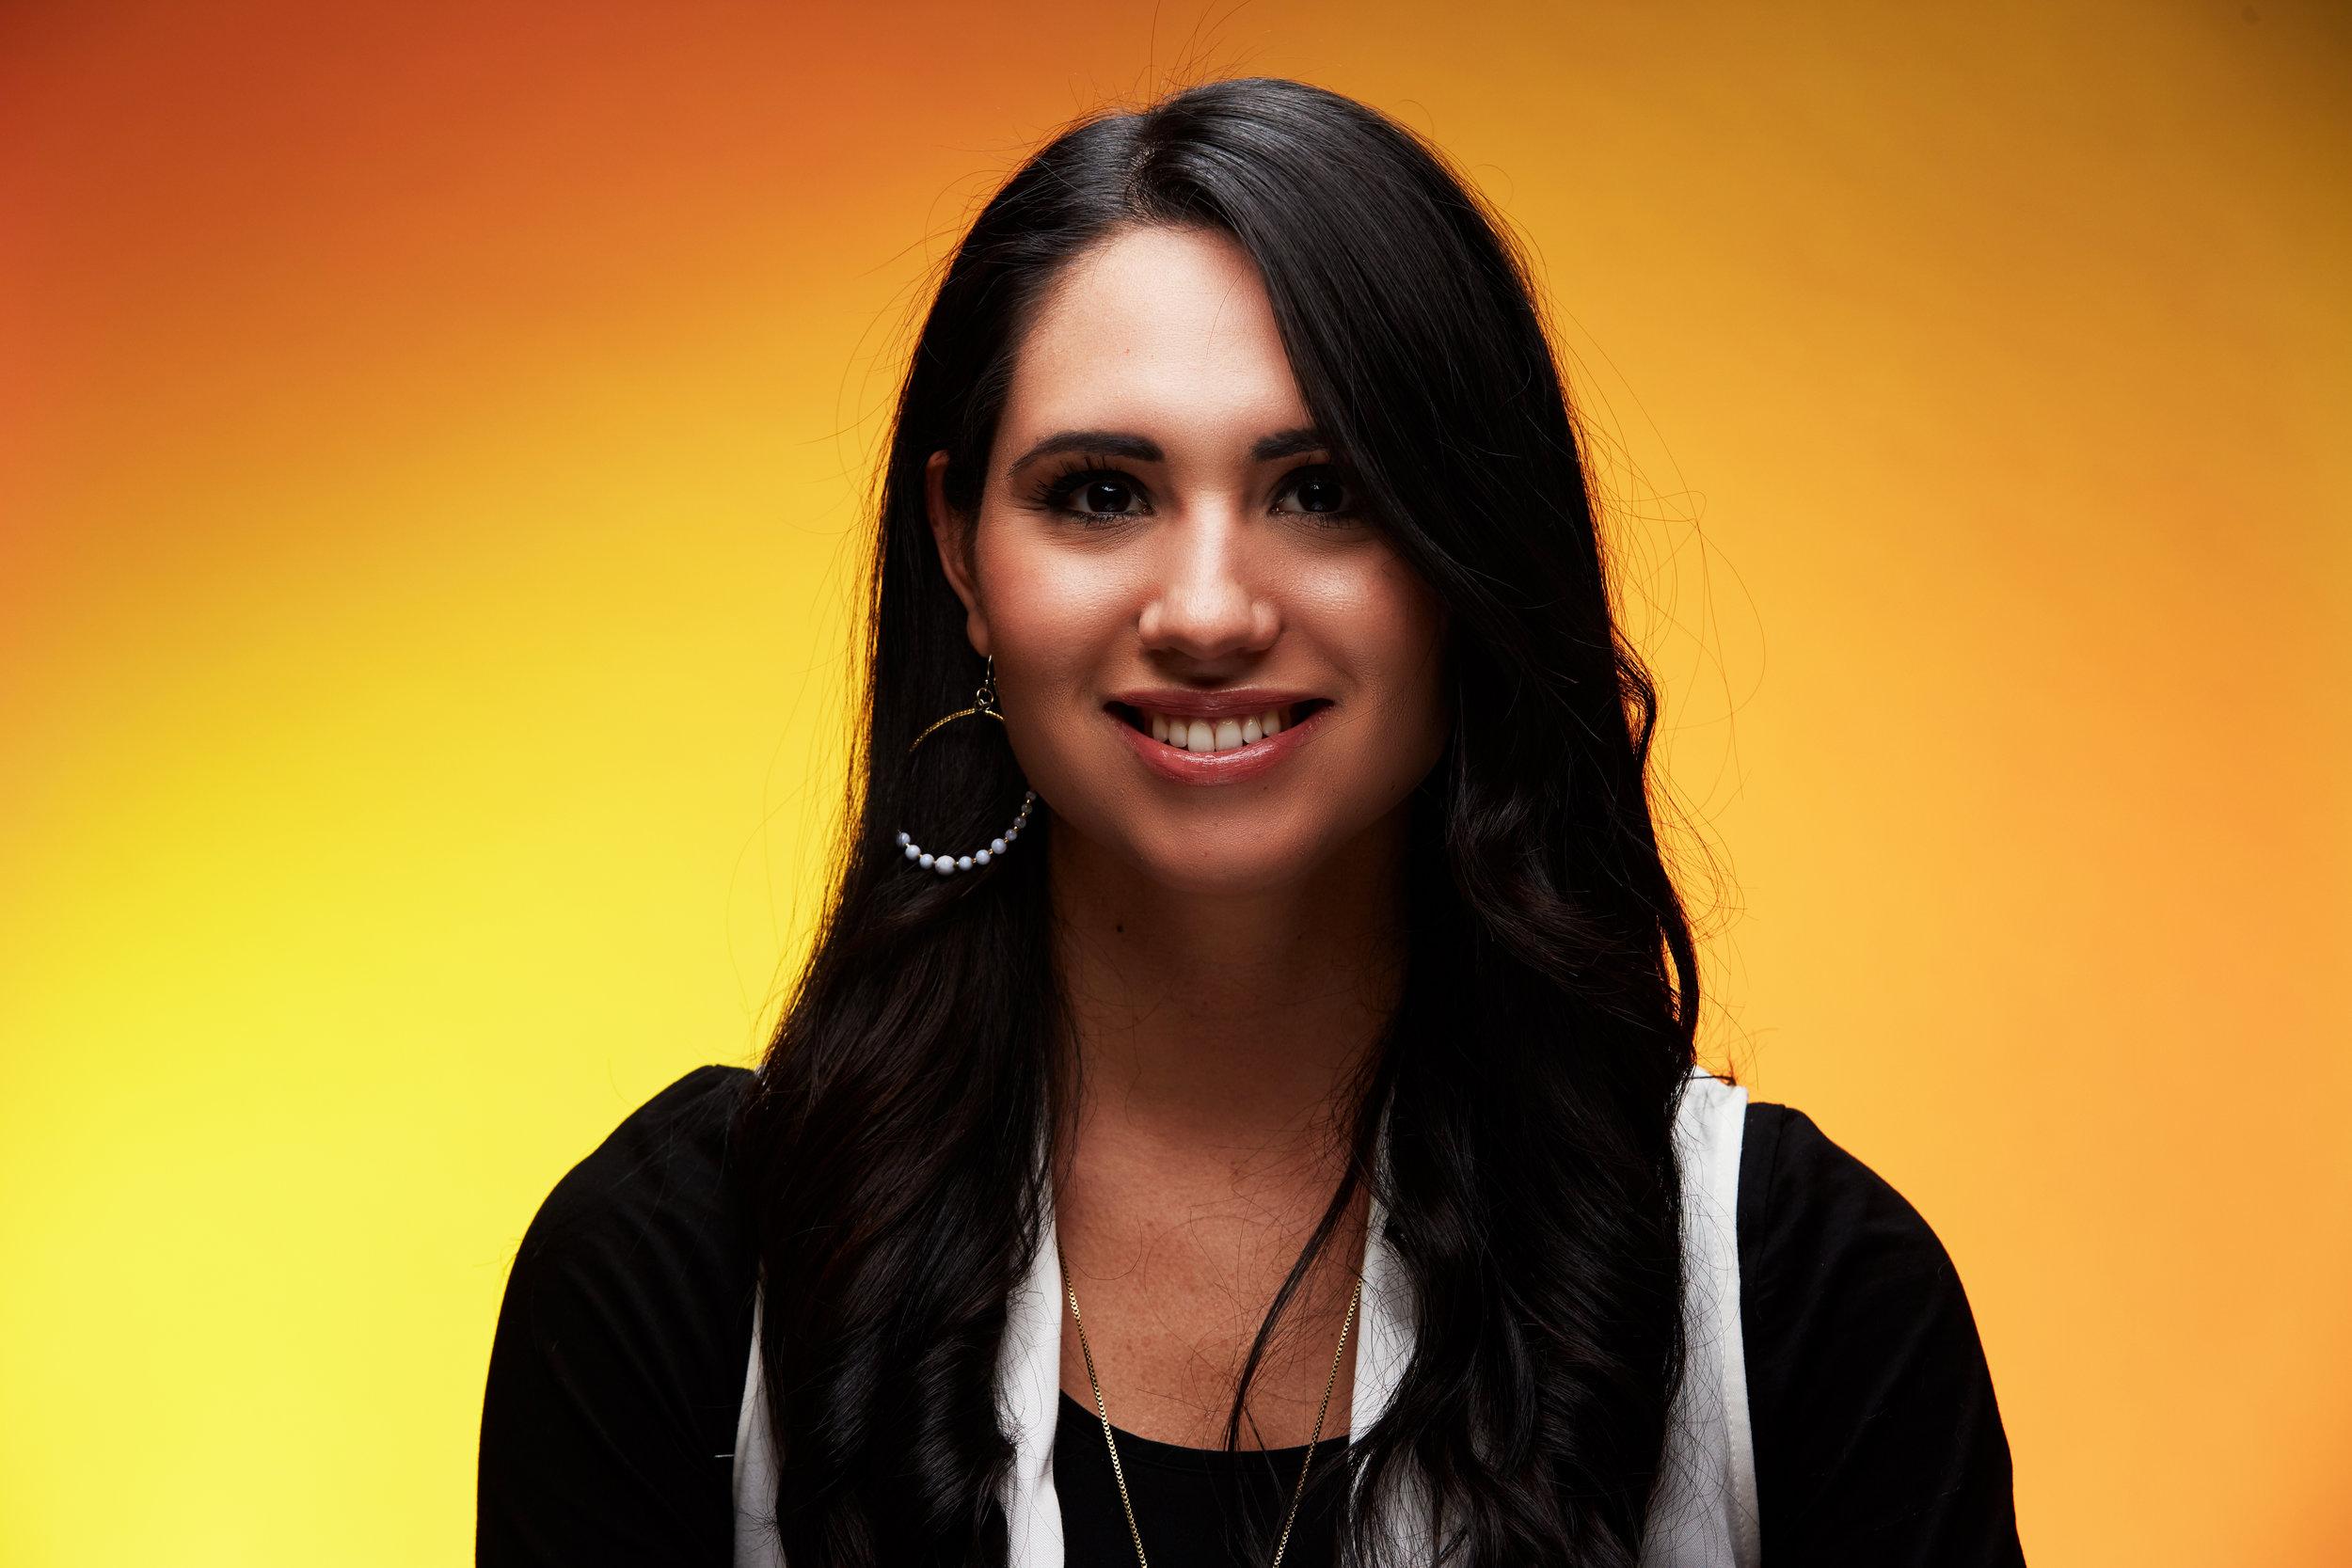 VICTORIA ALSPACH - CREATIVE DIRECTOR & OFFICE MANAGER